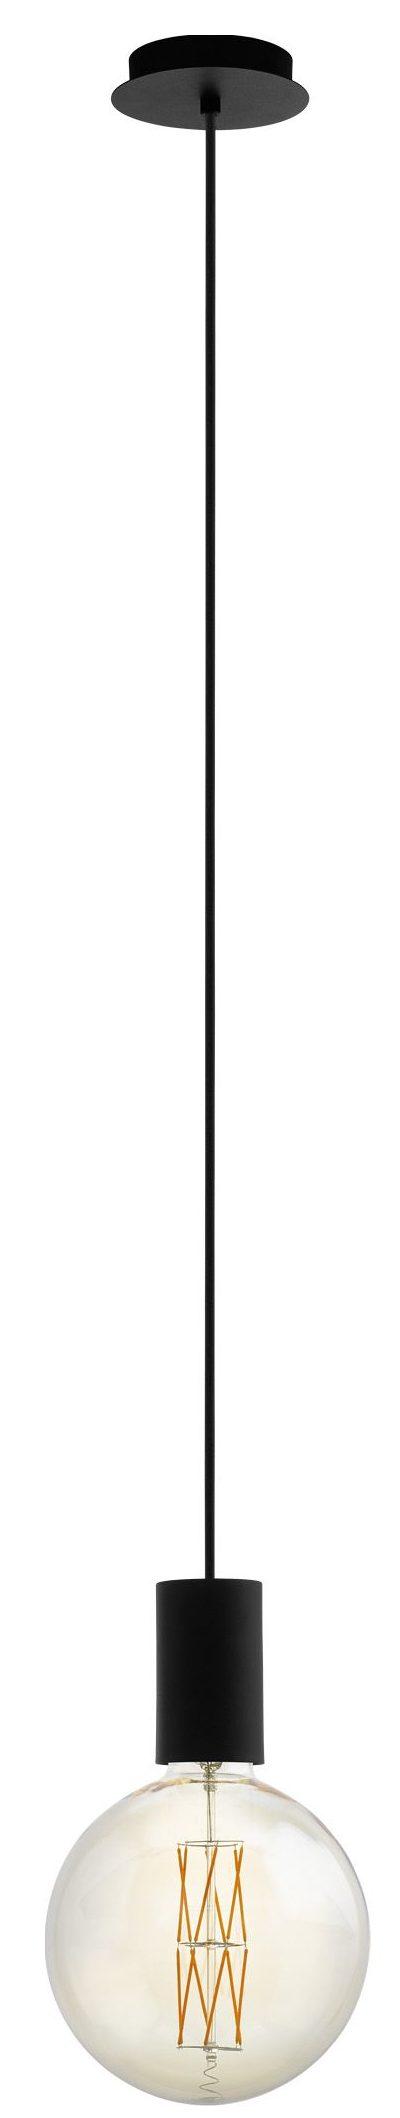 Hanglamp pozueta 1li e27 zwart - zwart Eglo Hanglamp 98661-EGLO